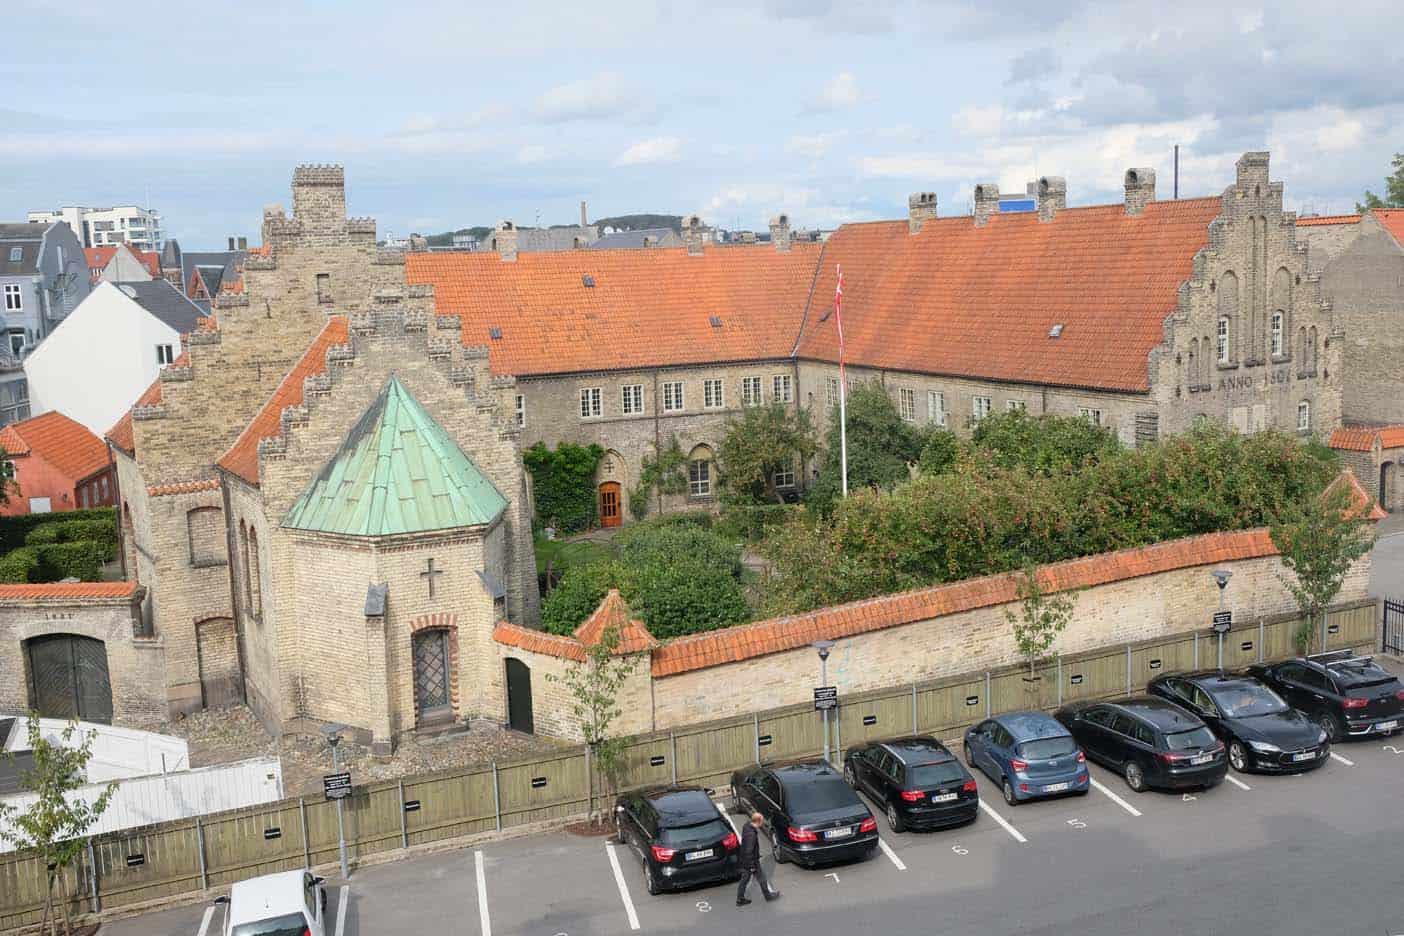 aalborg klooster